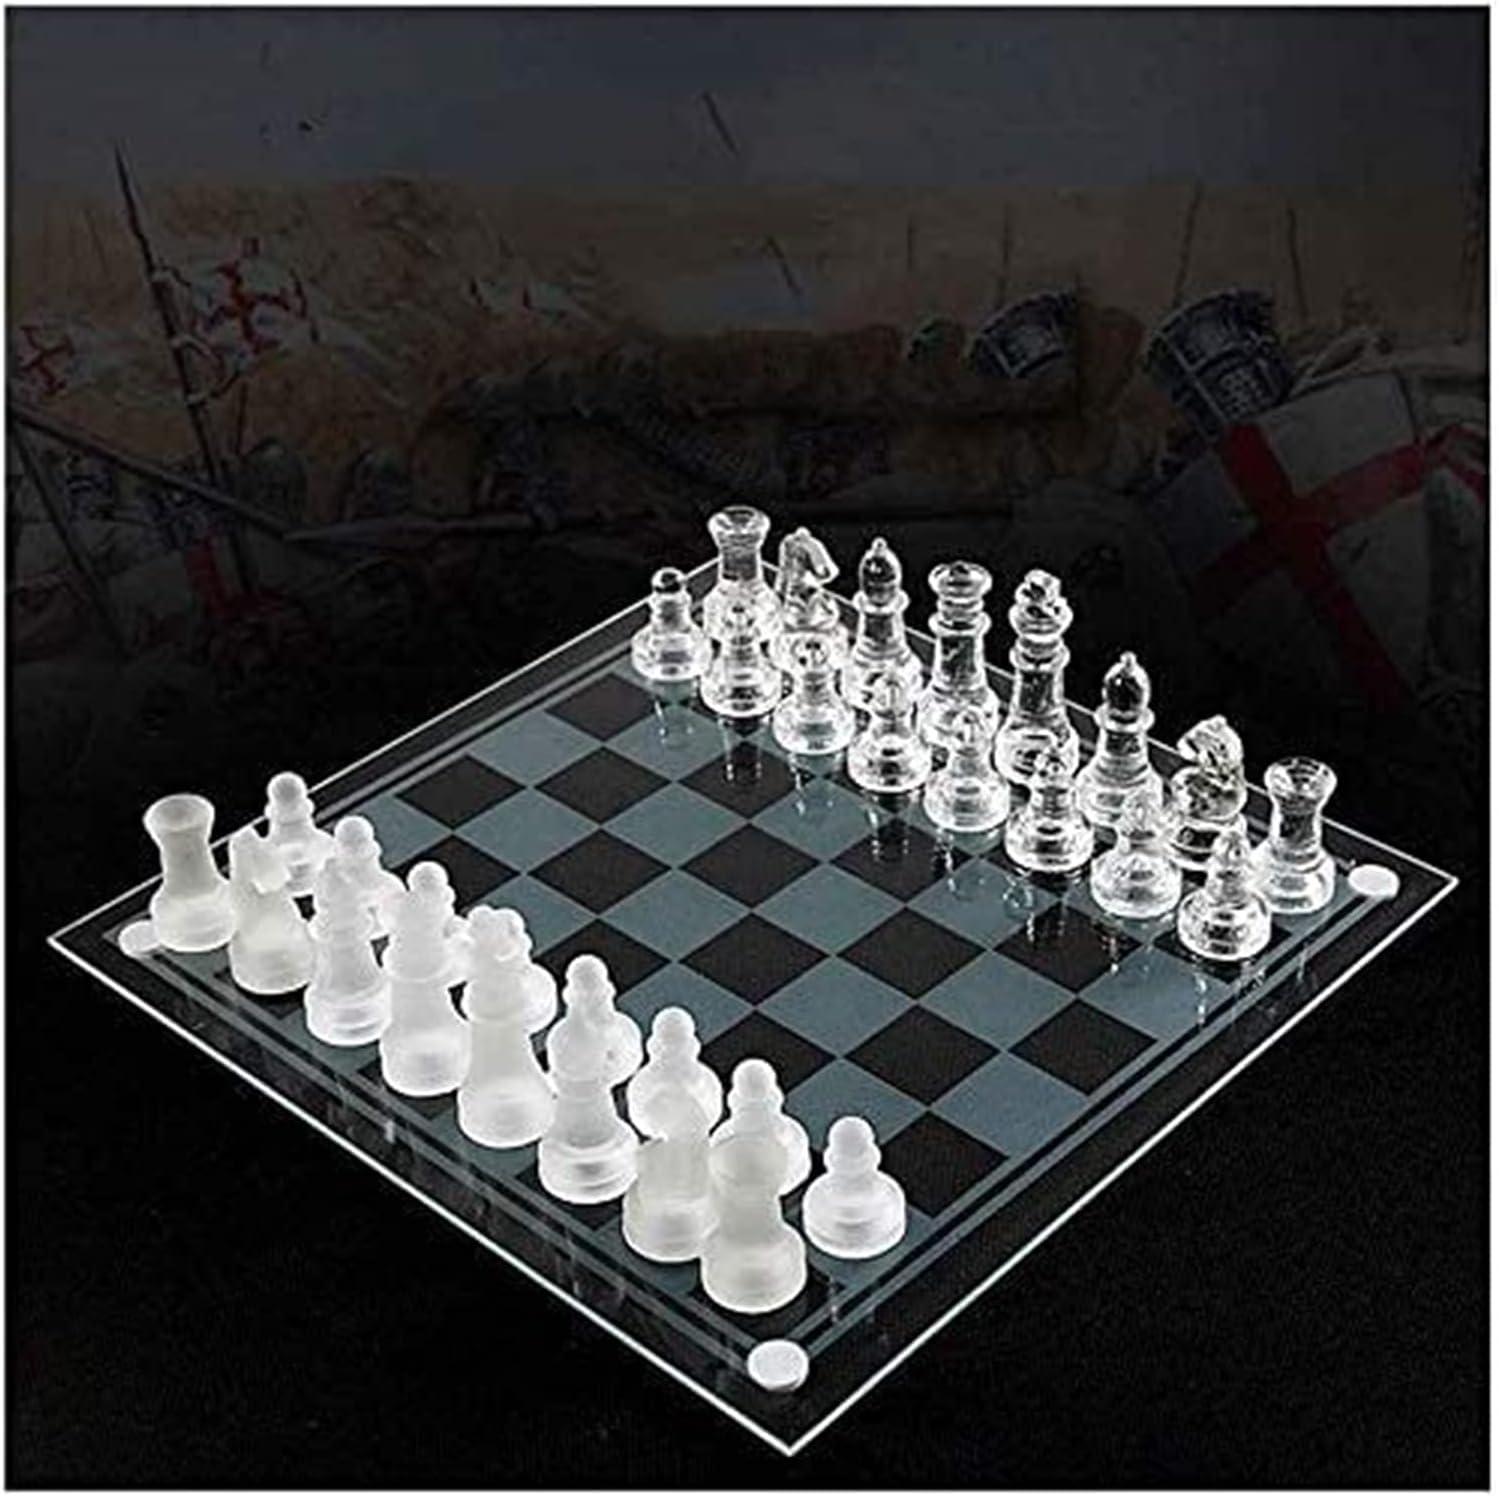 MTCWD Chess Set Games Travel Adults Dedication Board Max 84% OFF Glas Kids K9